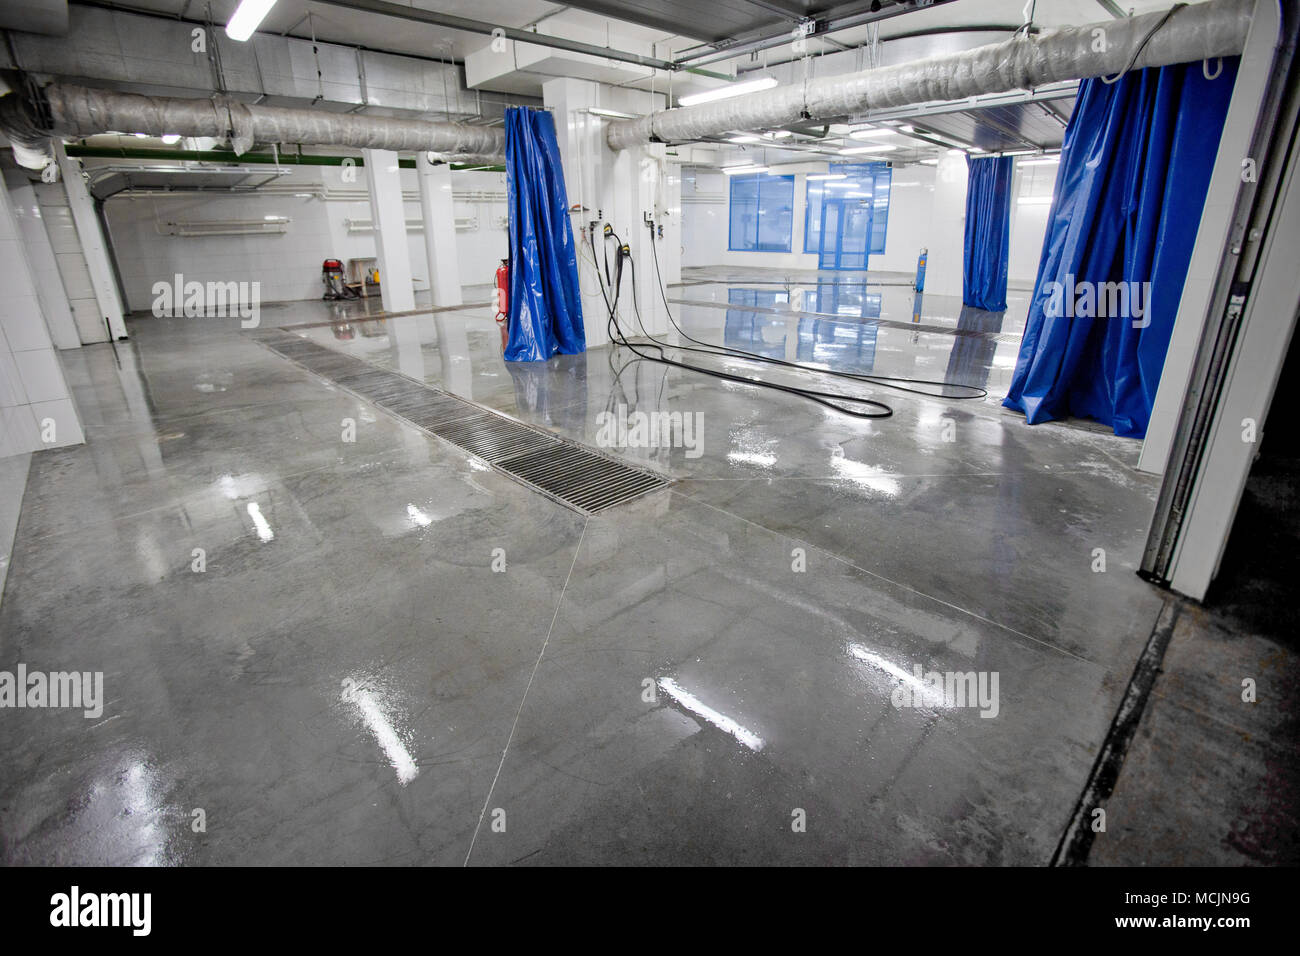 Interior space car wash Stock Photo: 179891420 - Alamy